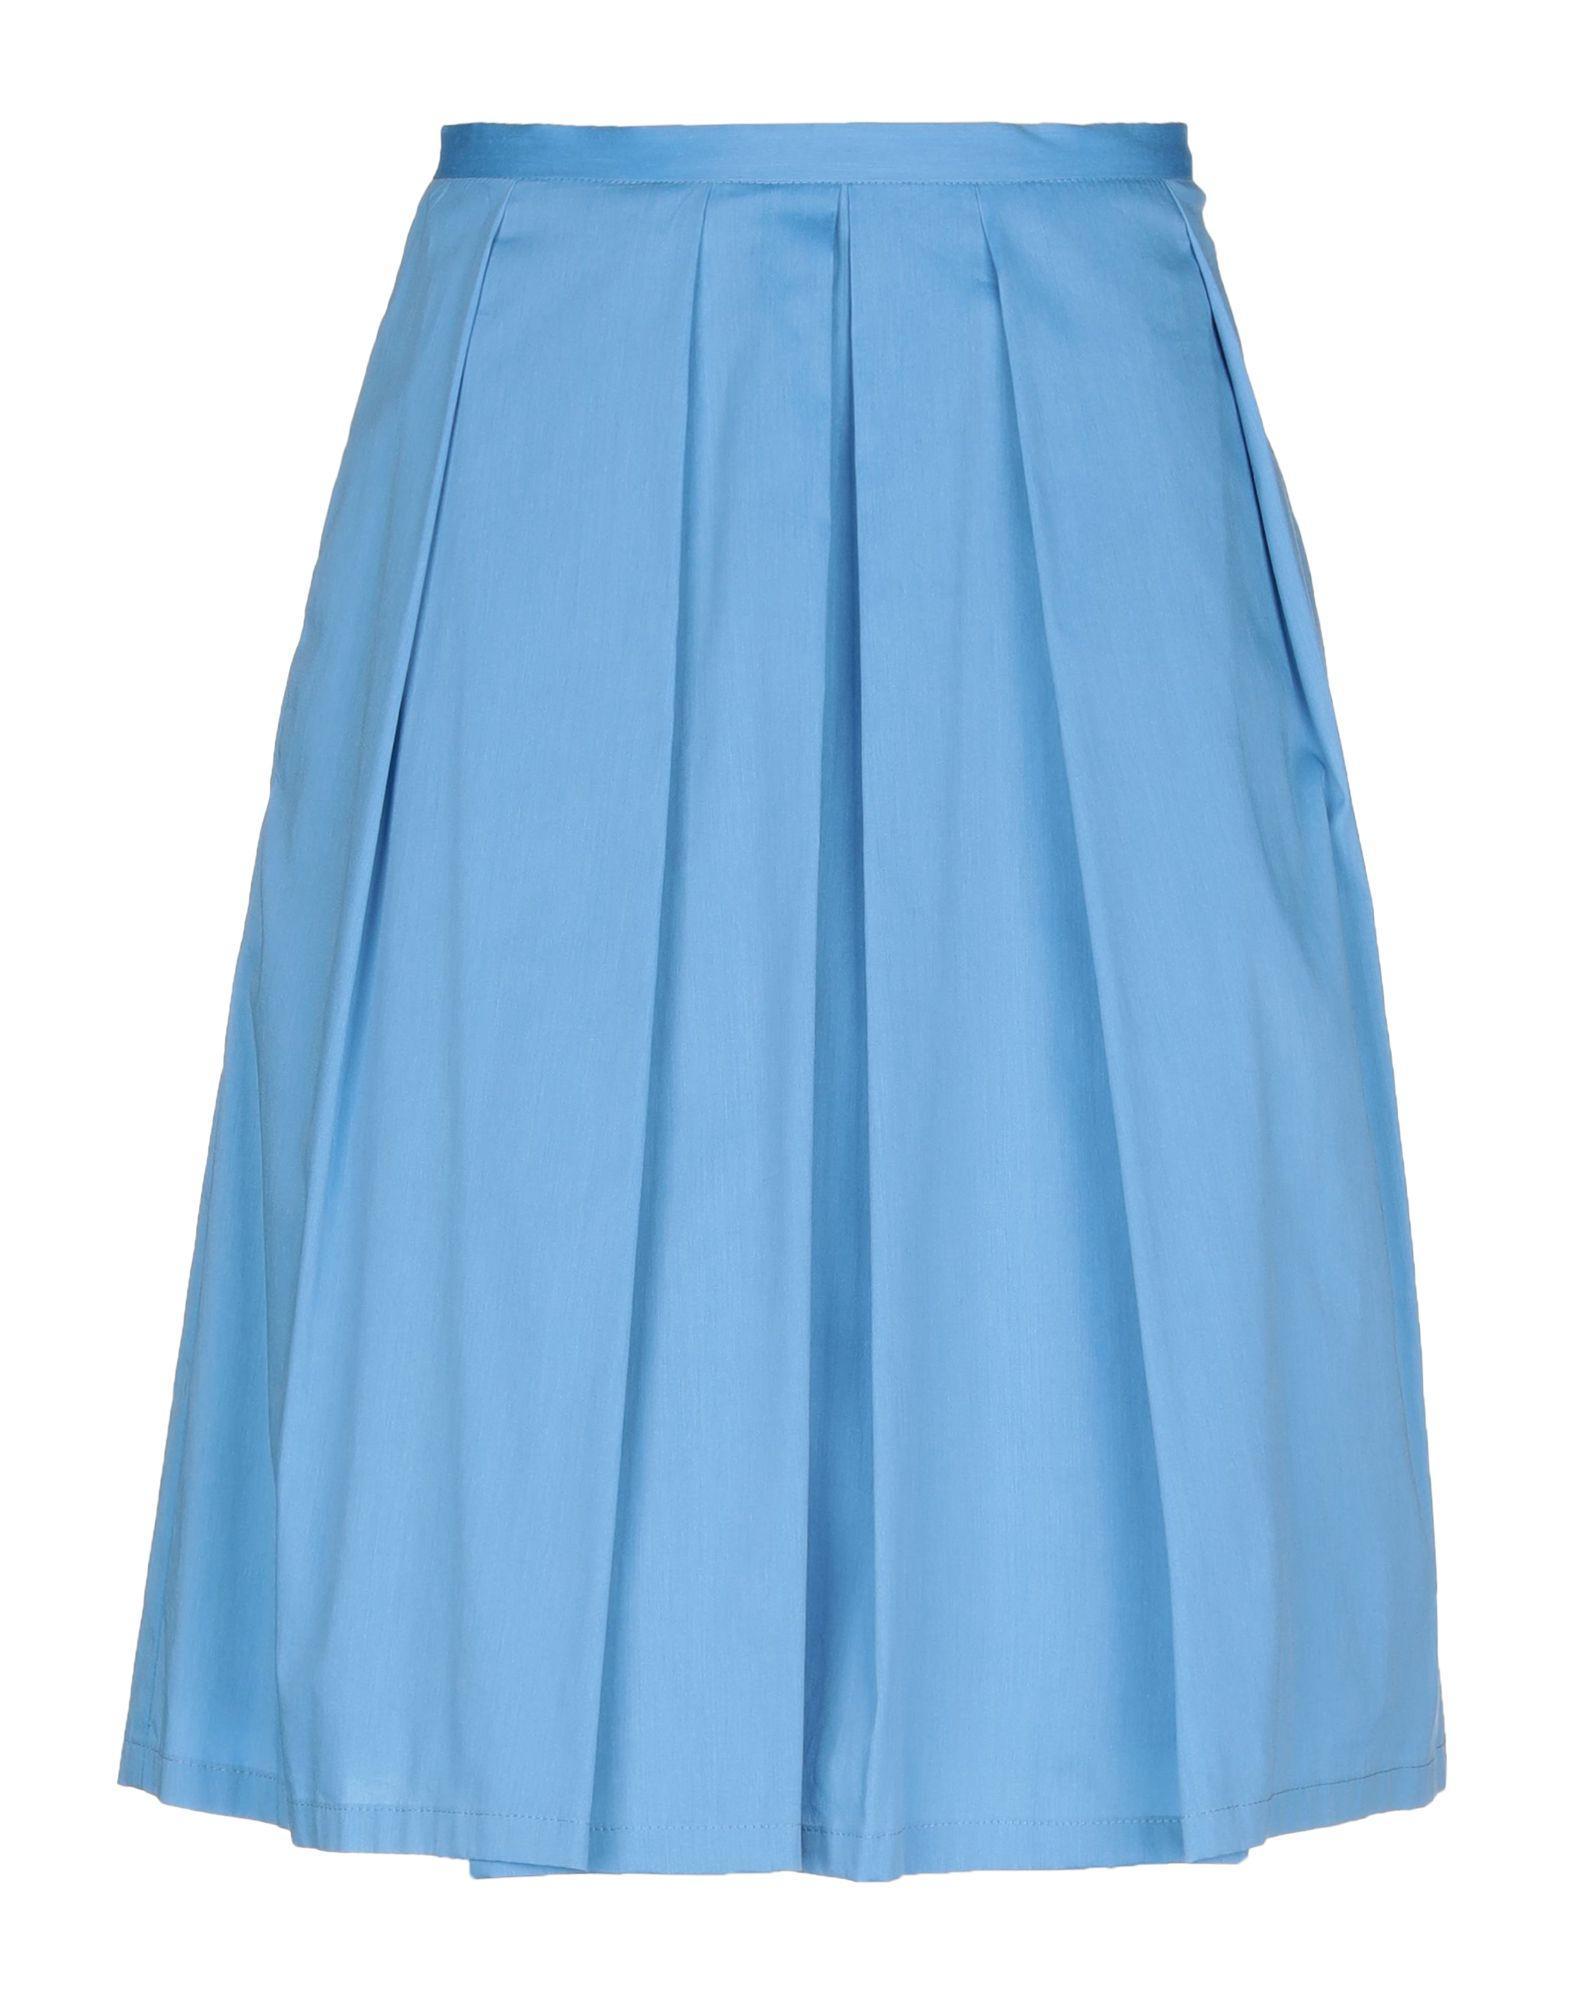 Юбка до колена  - Синий цвет